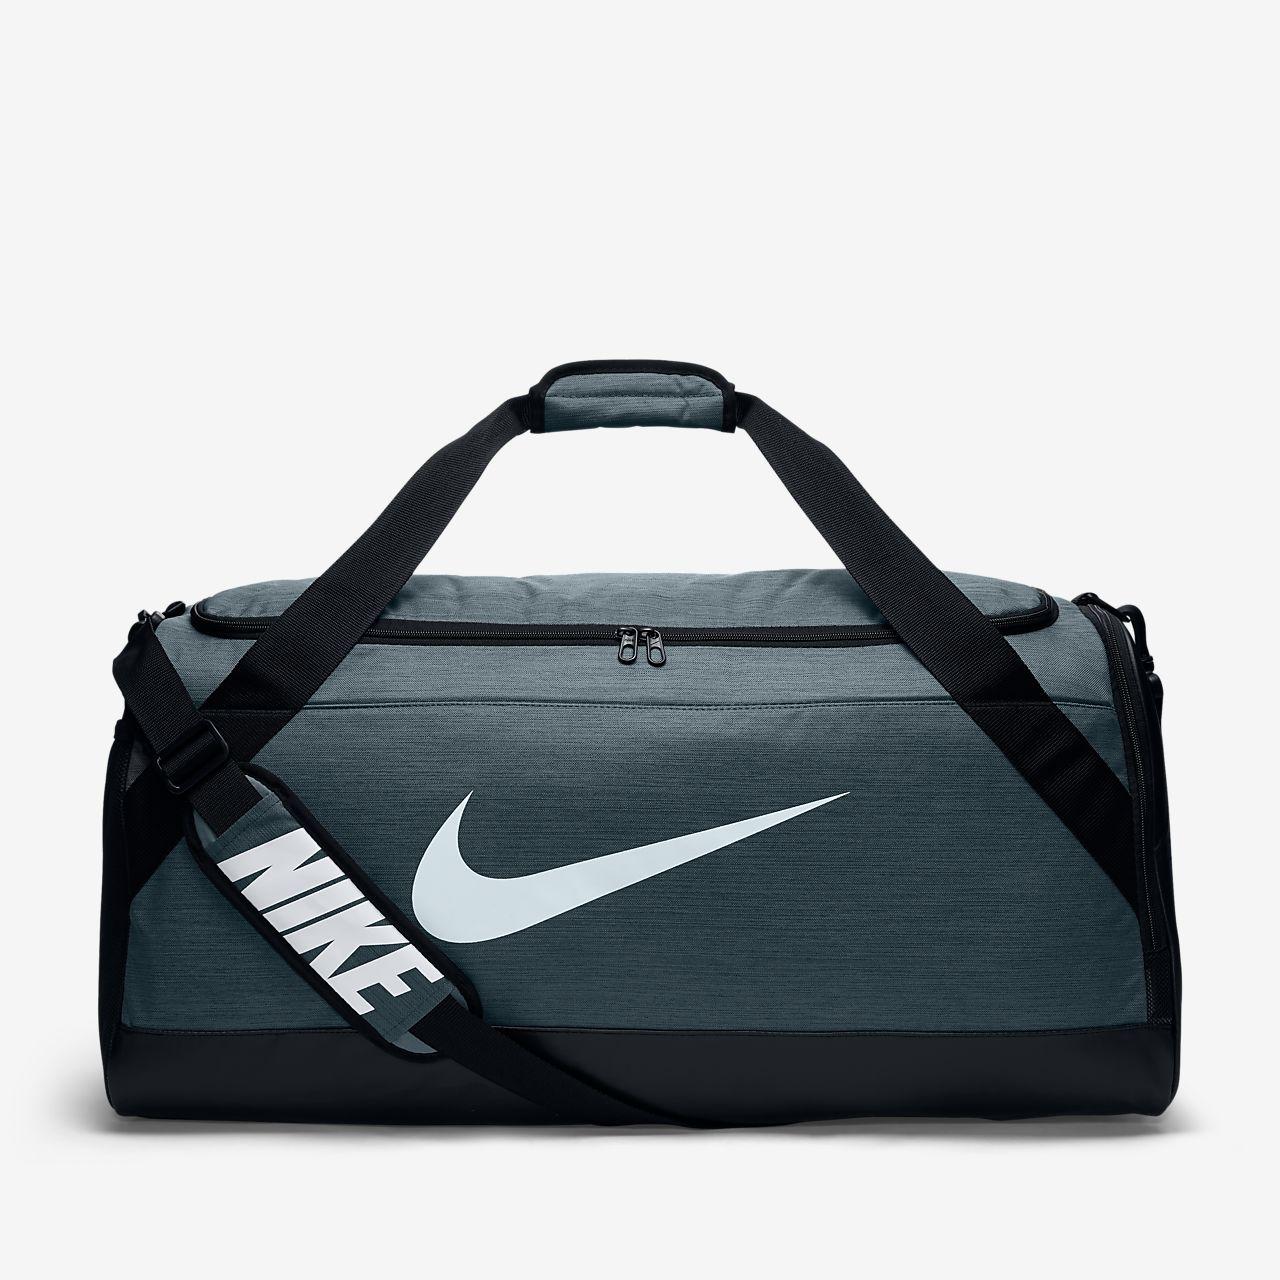 nike handbag handbags 2018